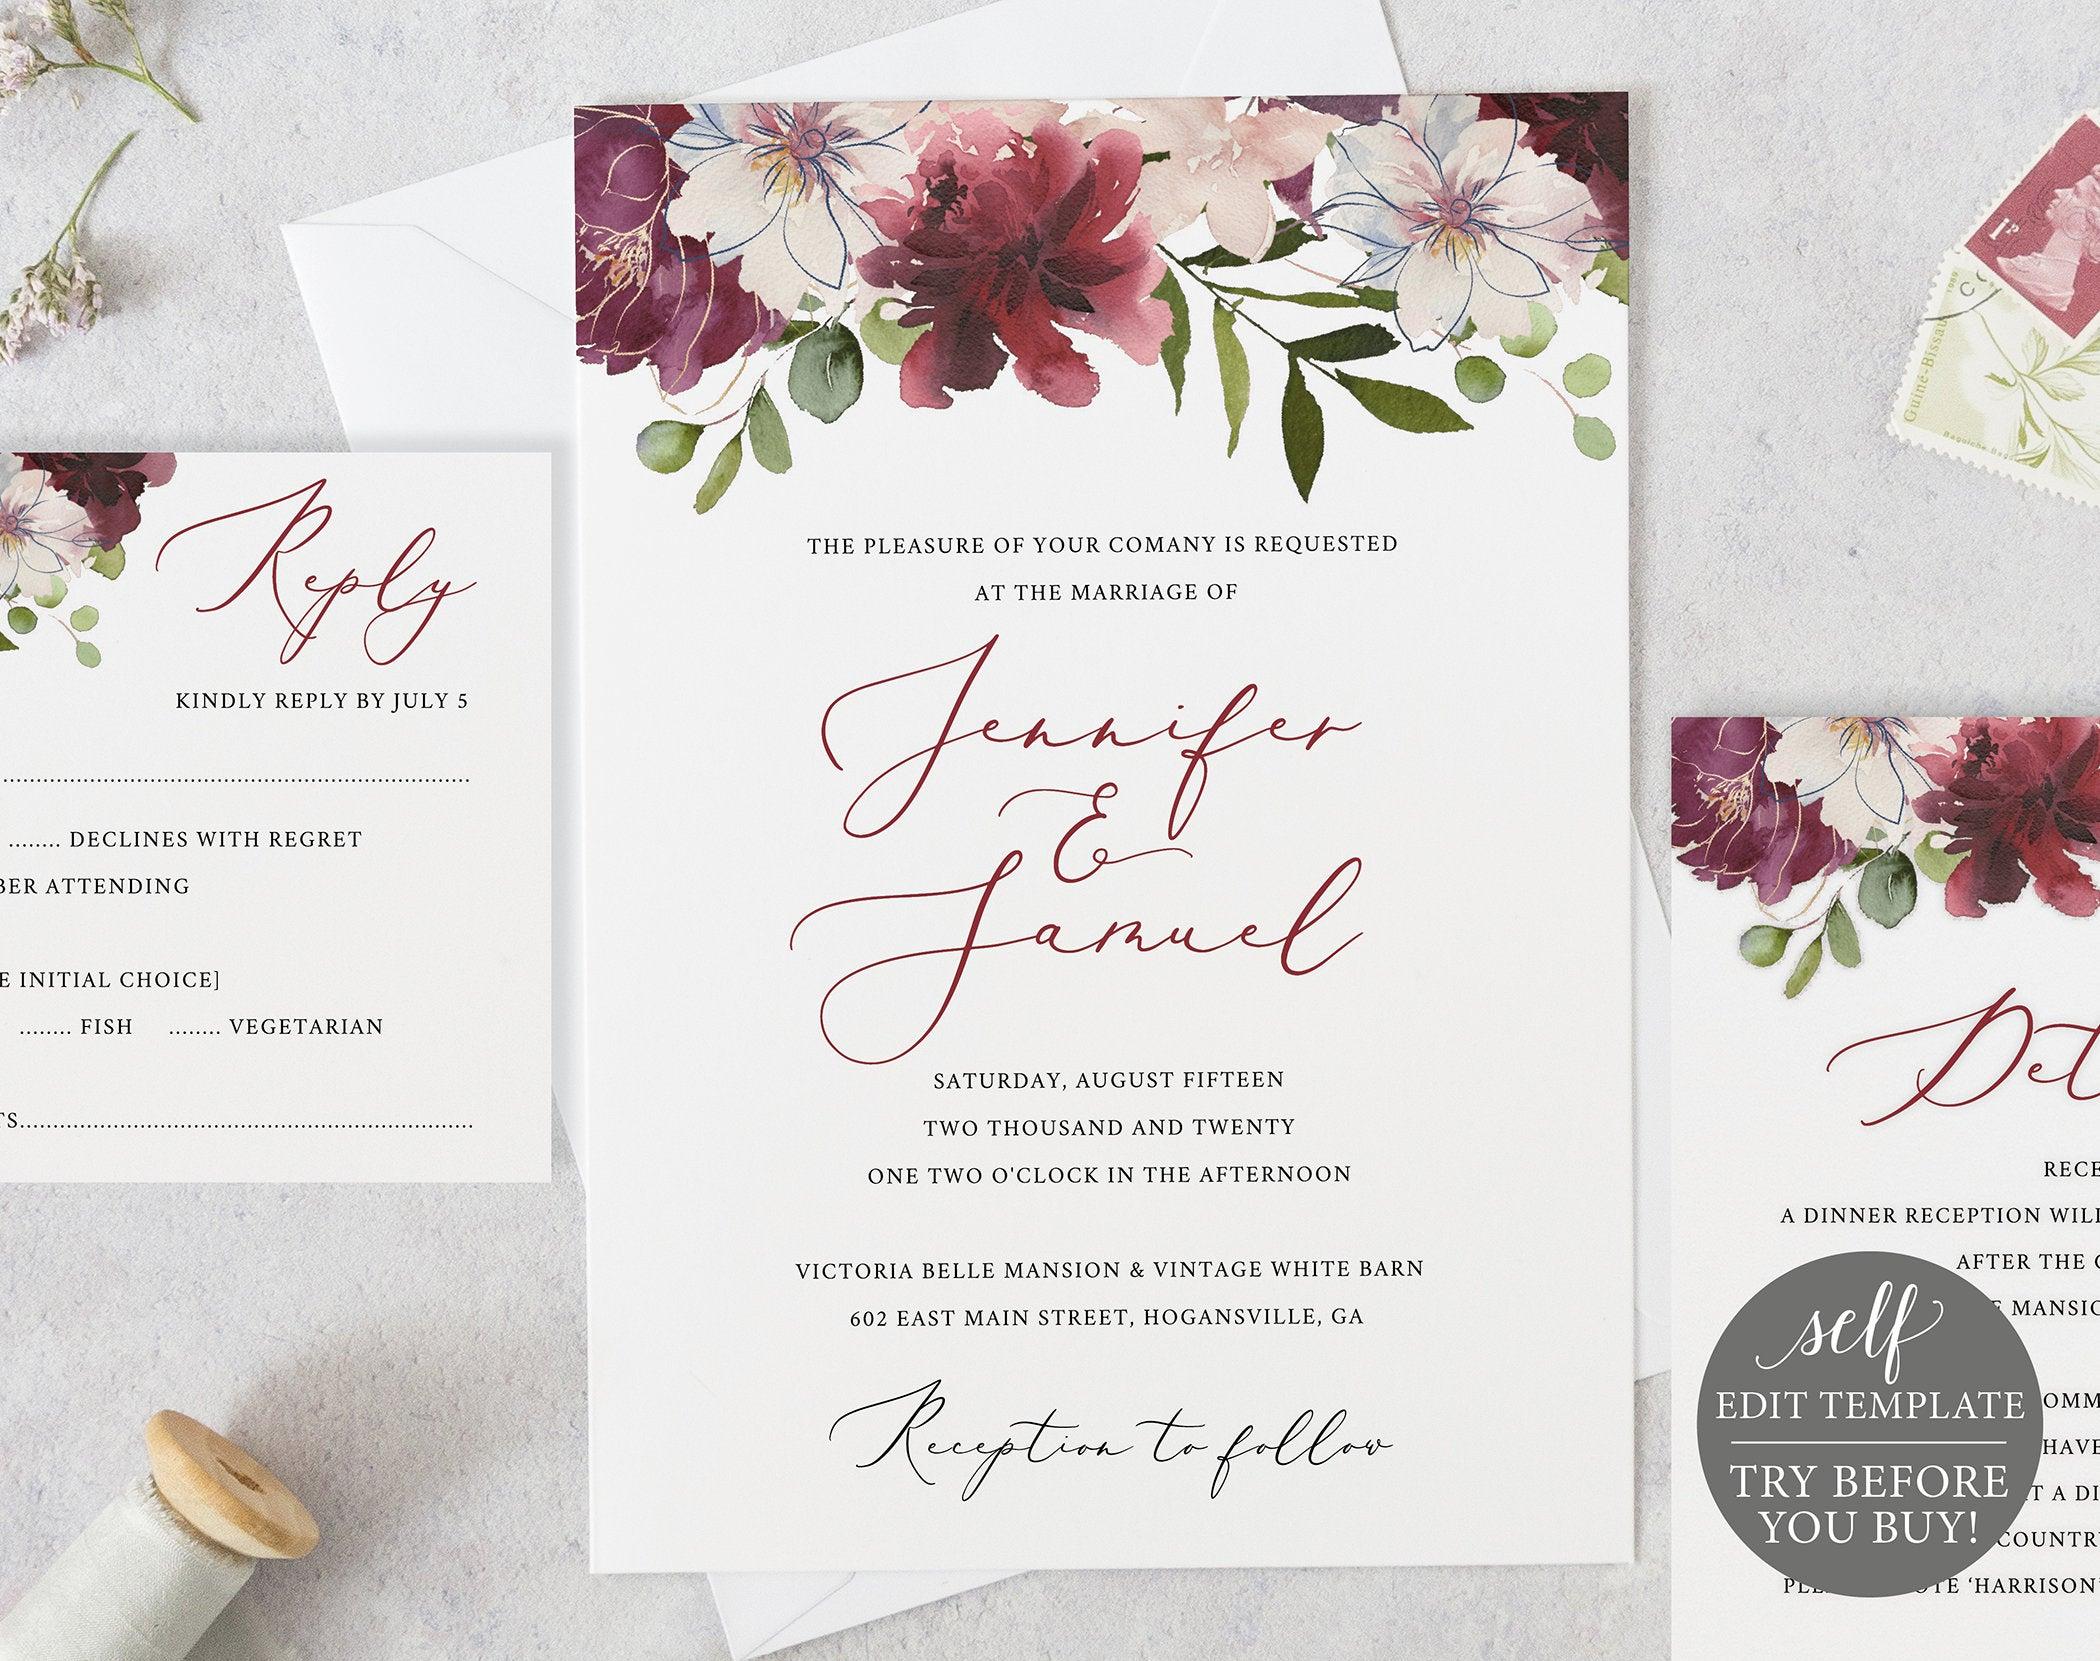 wedding invitation editable templates • business template